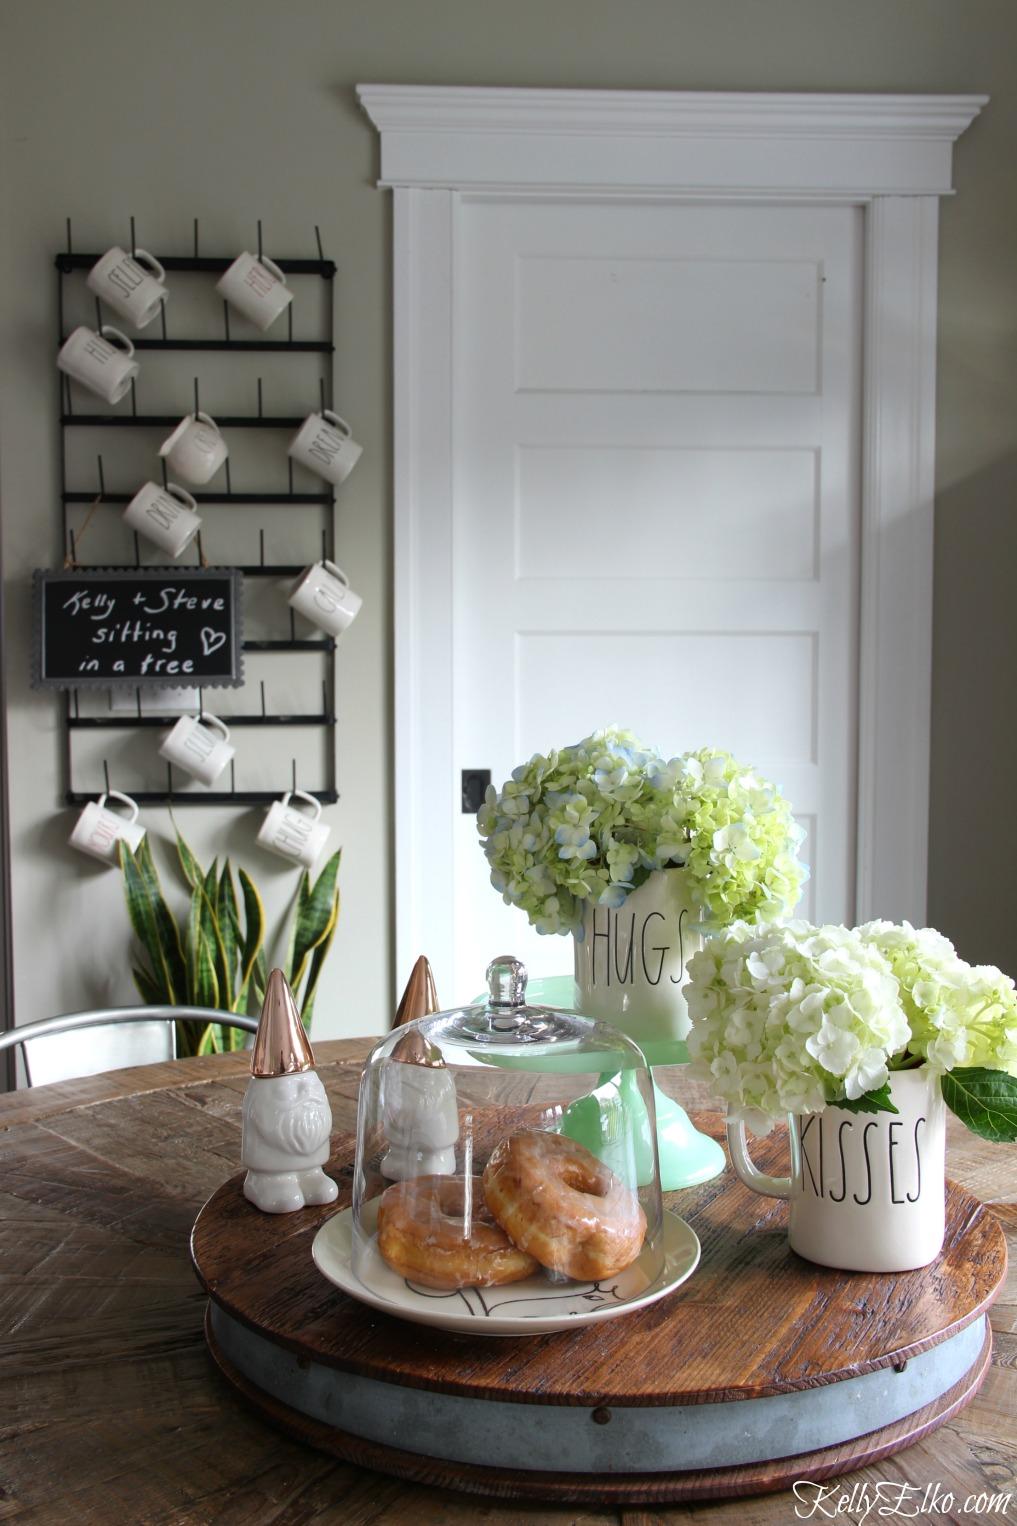 Farmhouse table centerpiece with hydrangeas kellyelko.com